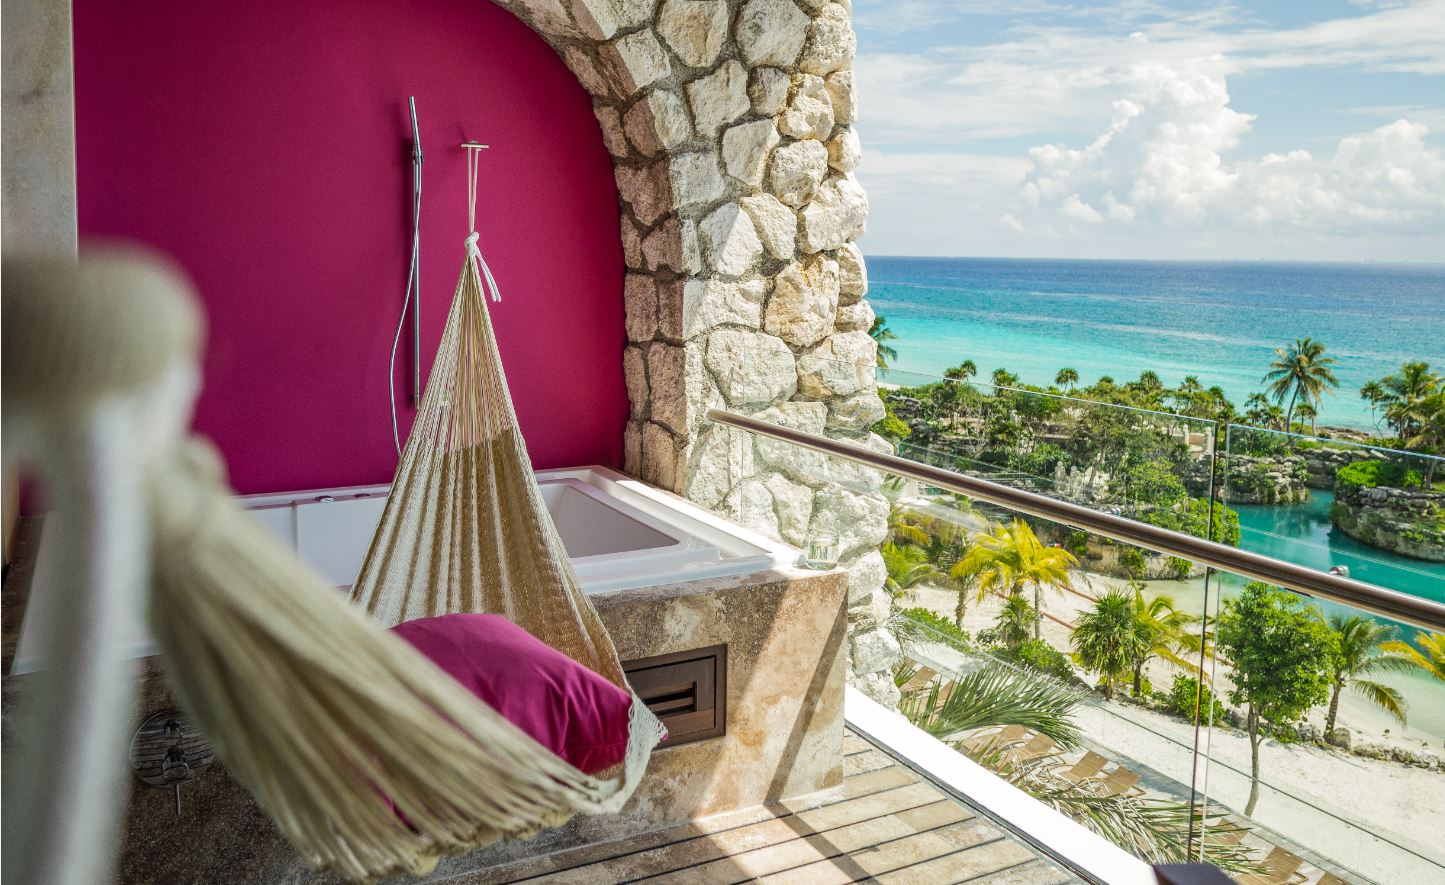 hotel-xcaret-suite-ocean-view.jpg